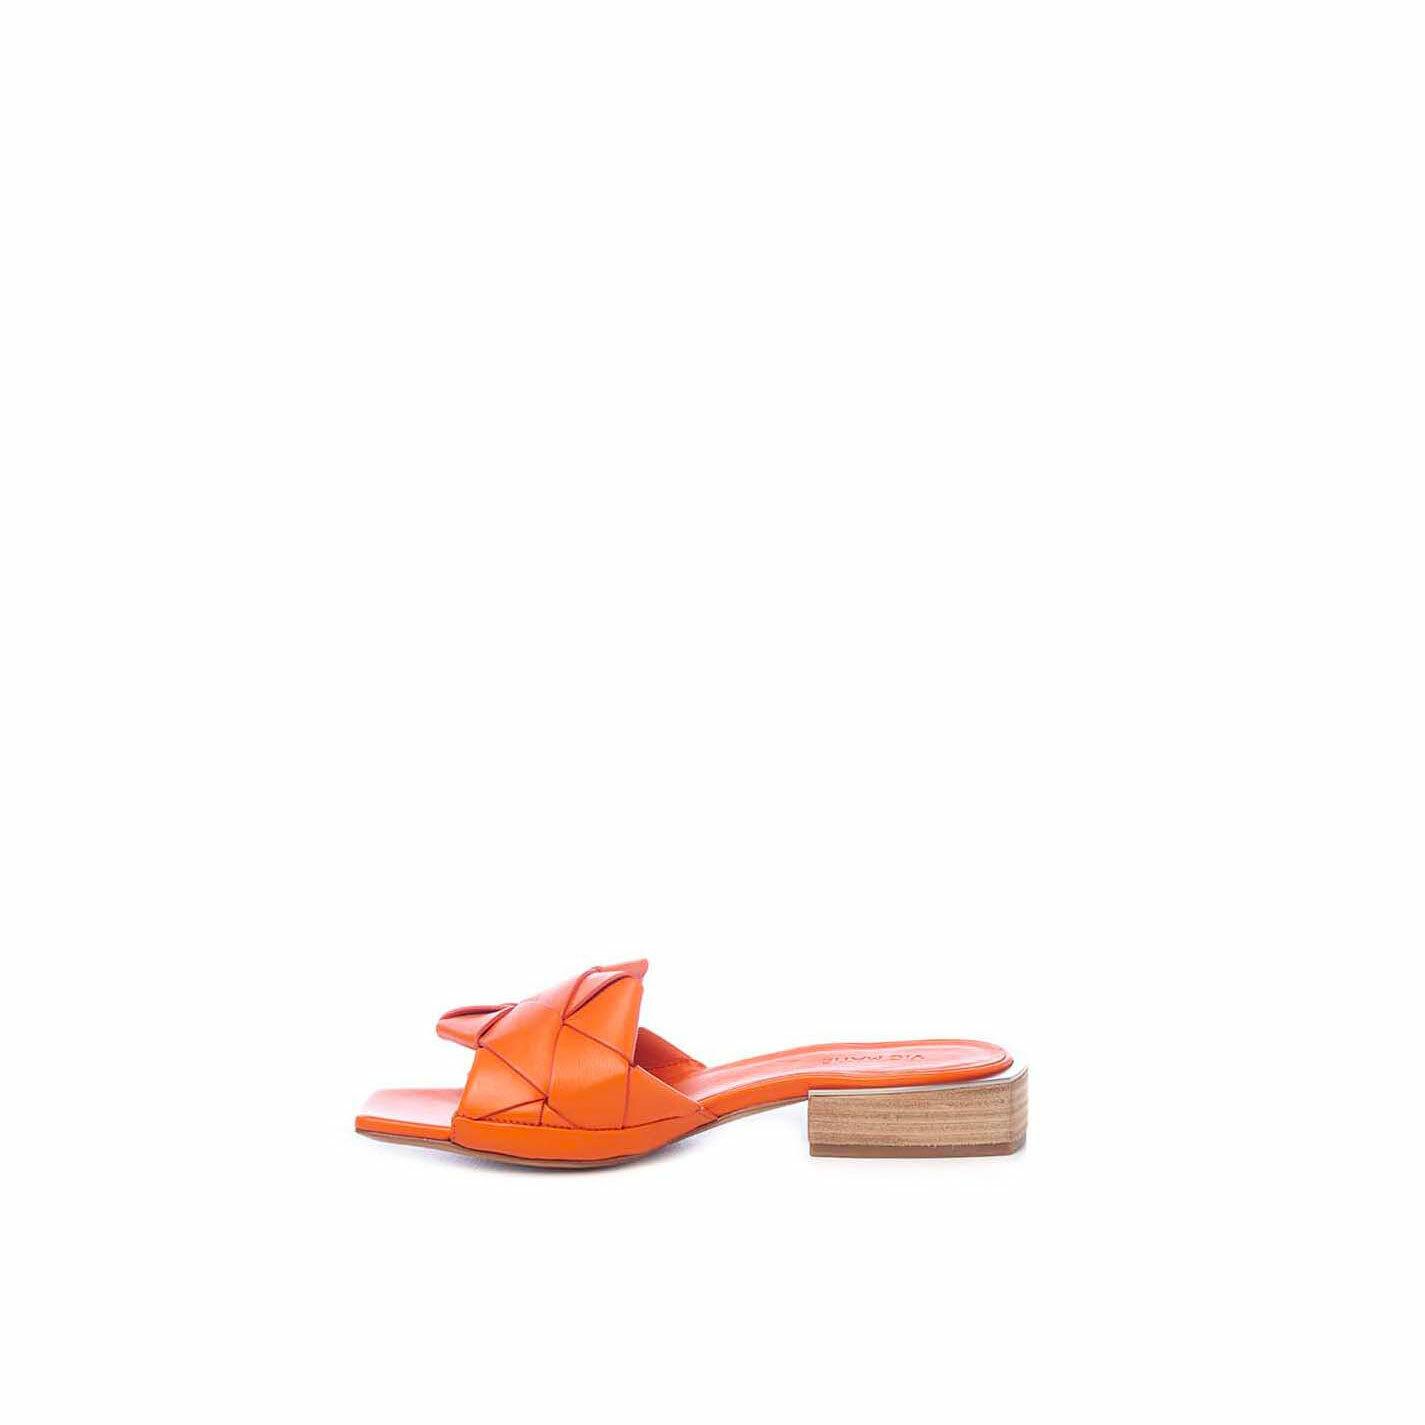 Flat orange calfskin slip-ons